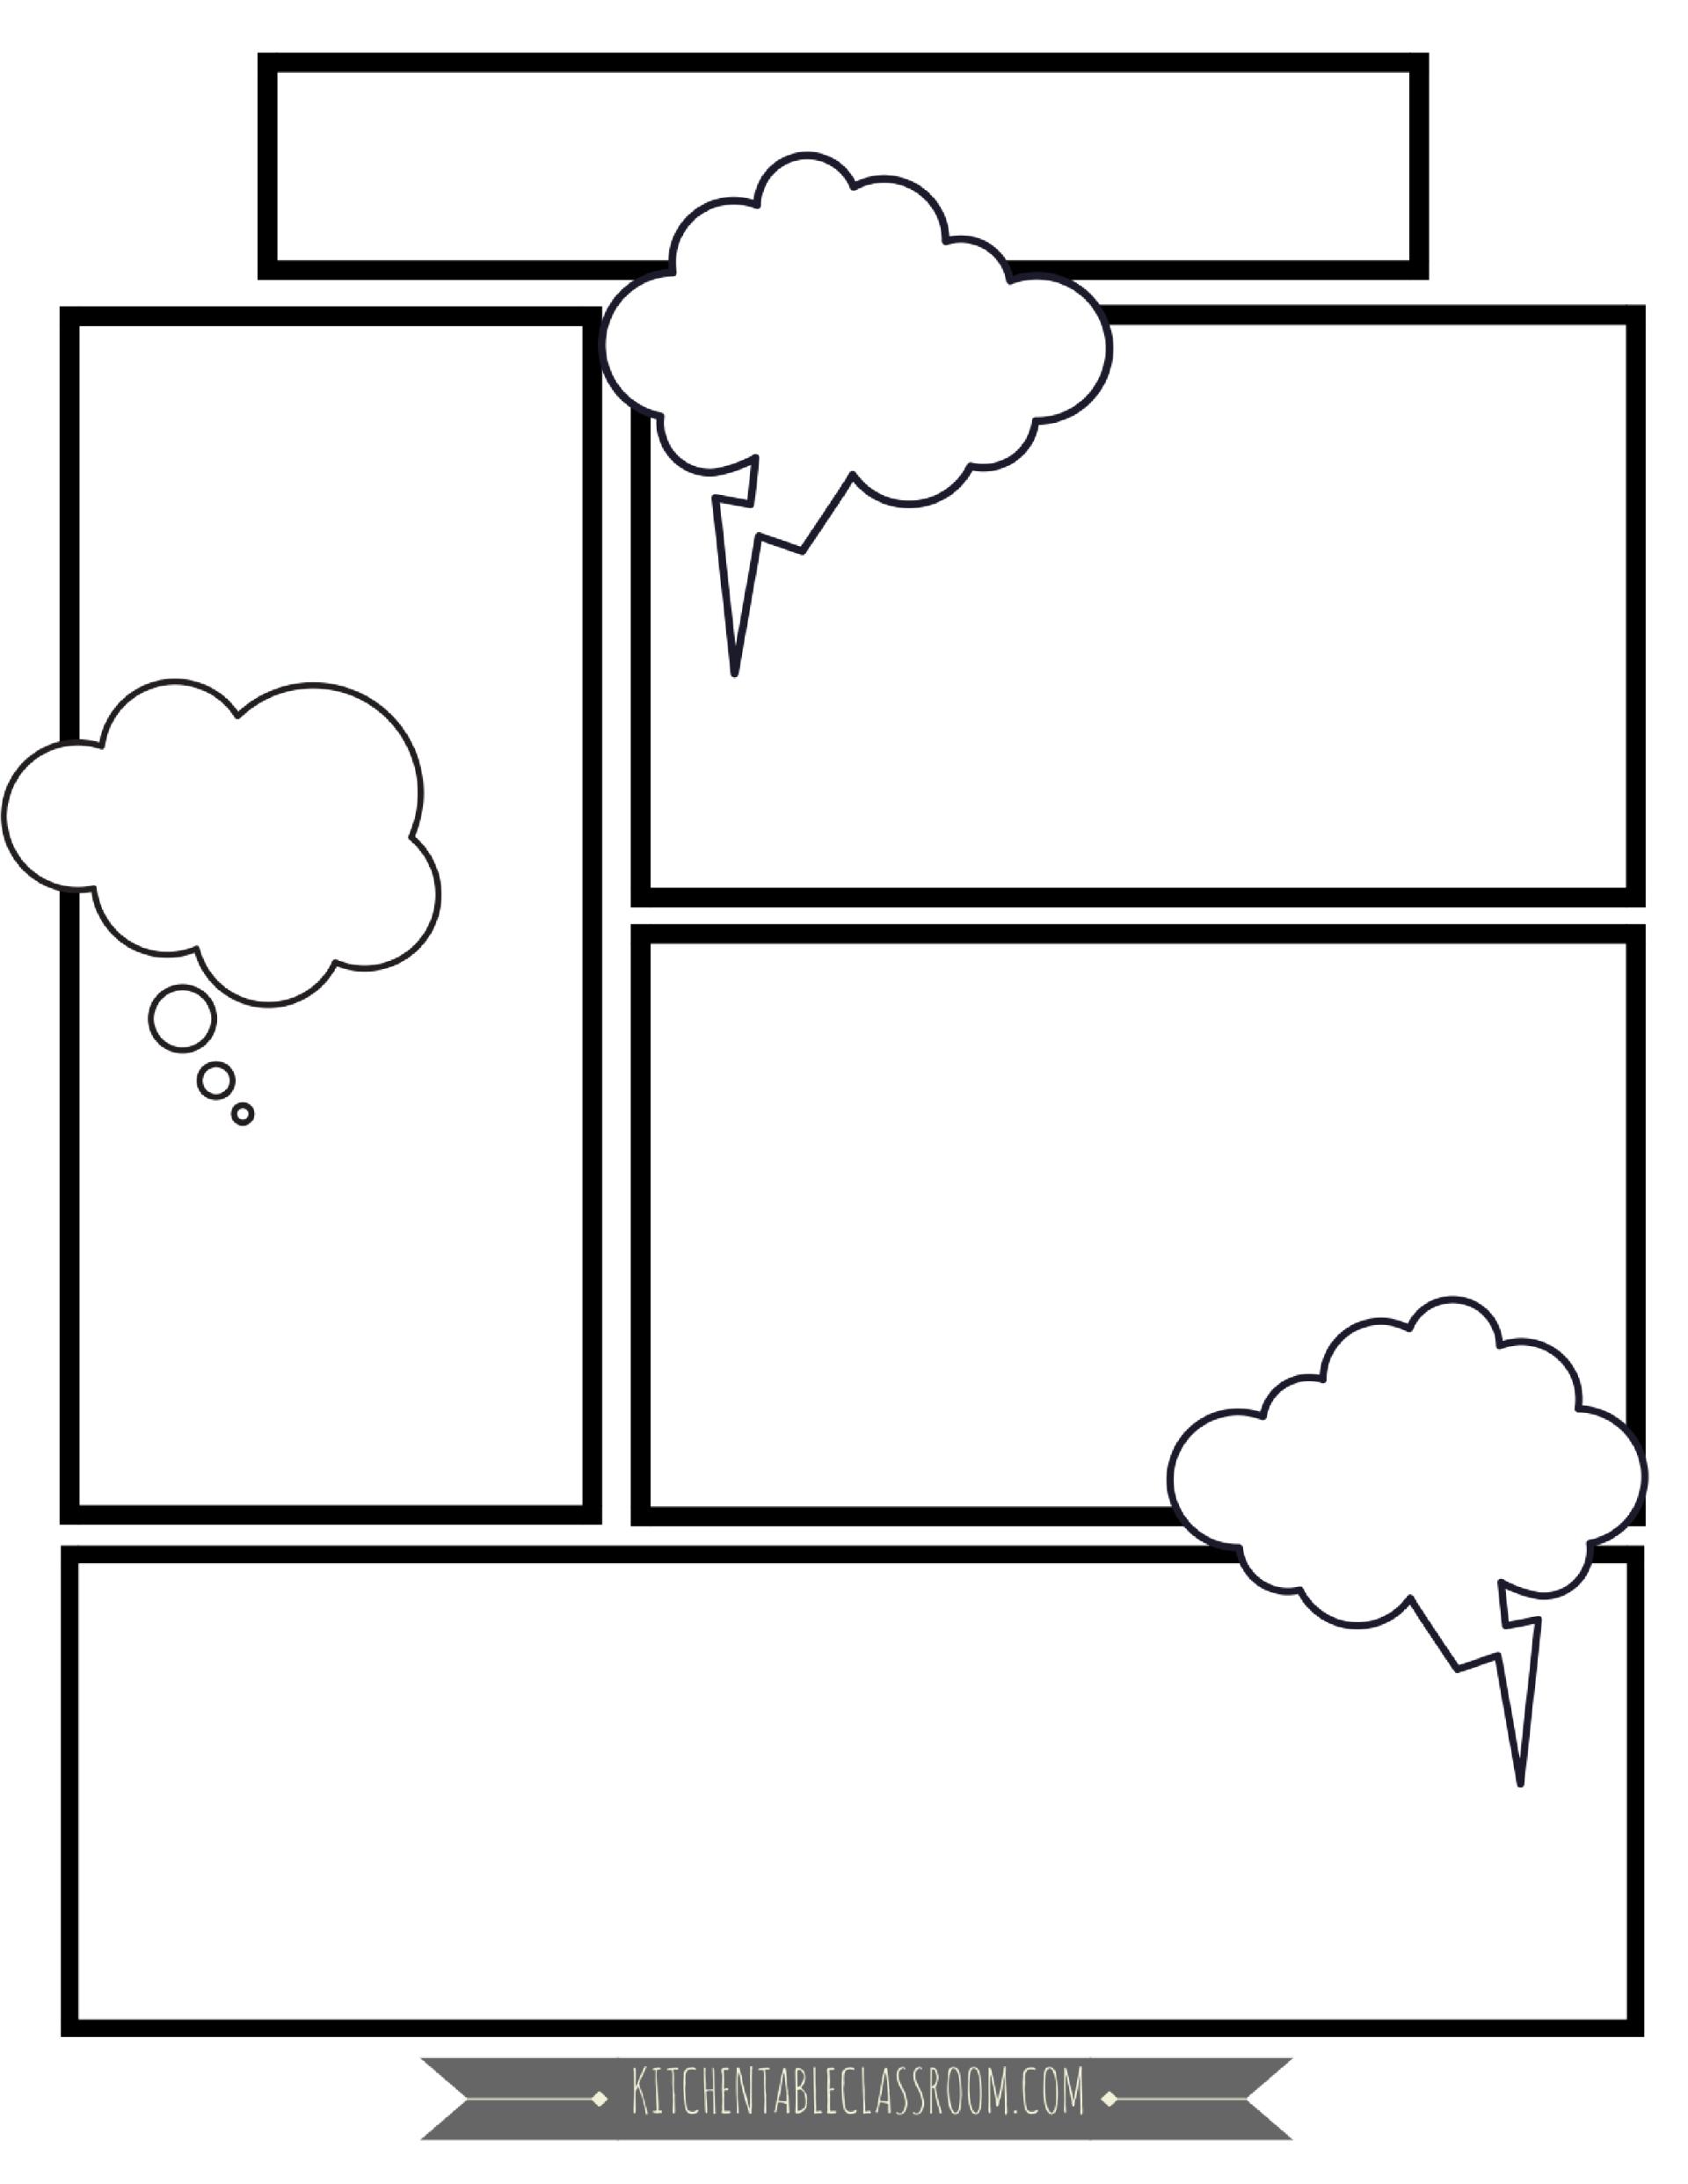 Comic Book Templates  Free Printable Pages  תכנים  Comic Book With Regard To Printable Blank Comic Strip Template For Kids